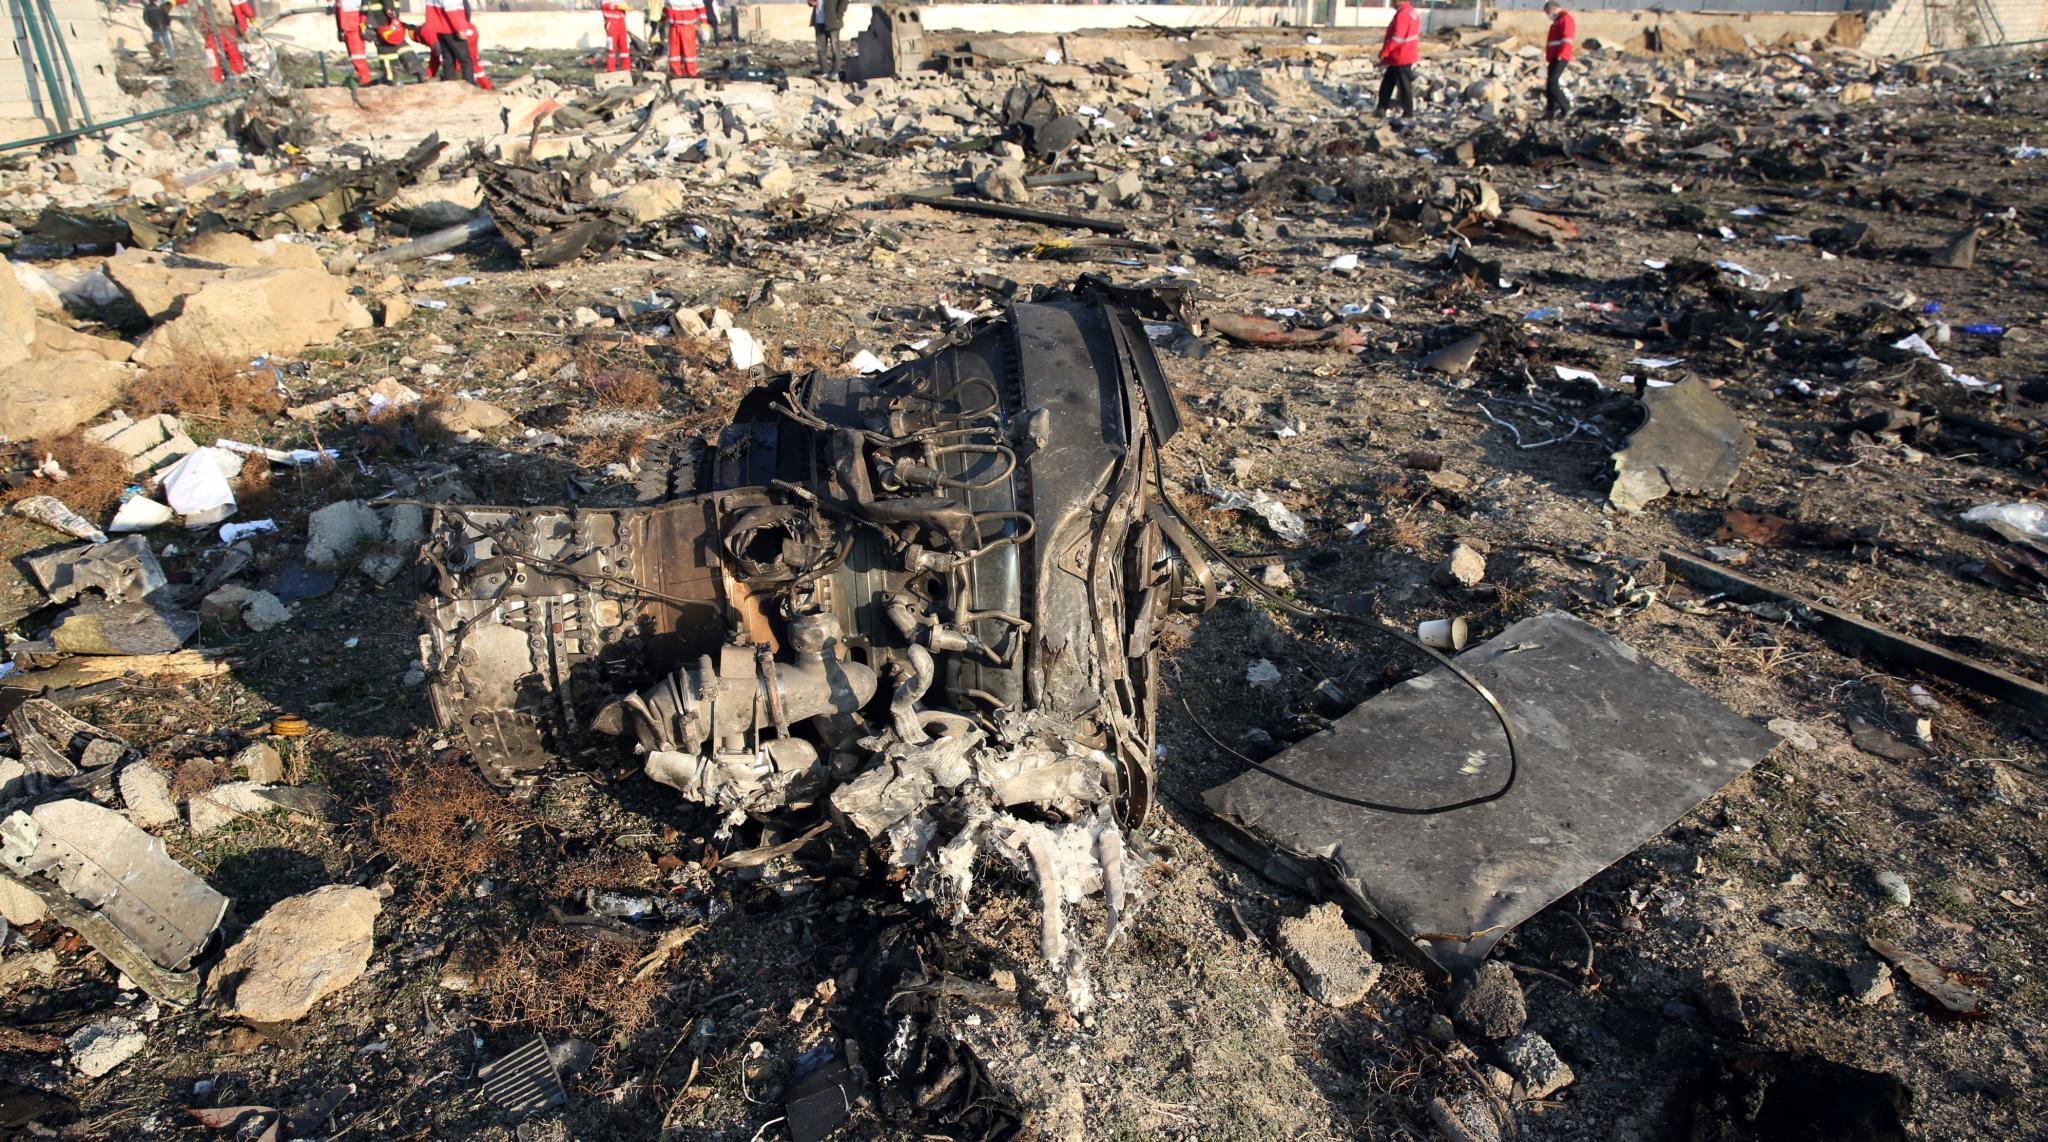 Iran Plane Crash: Ukraine President Volodymyr Zelensky Demands Punishment, Compensation for Airliner Downed by Tehran